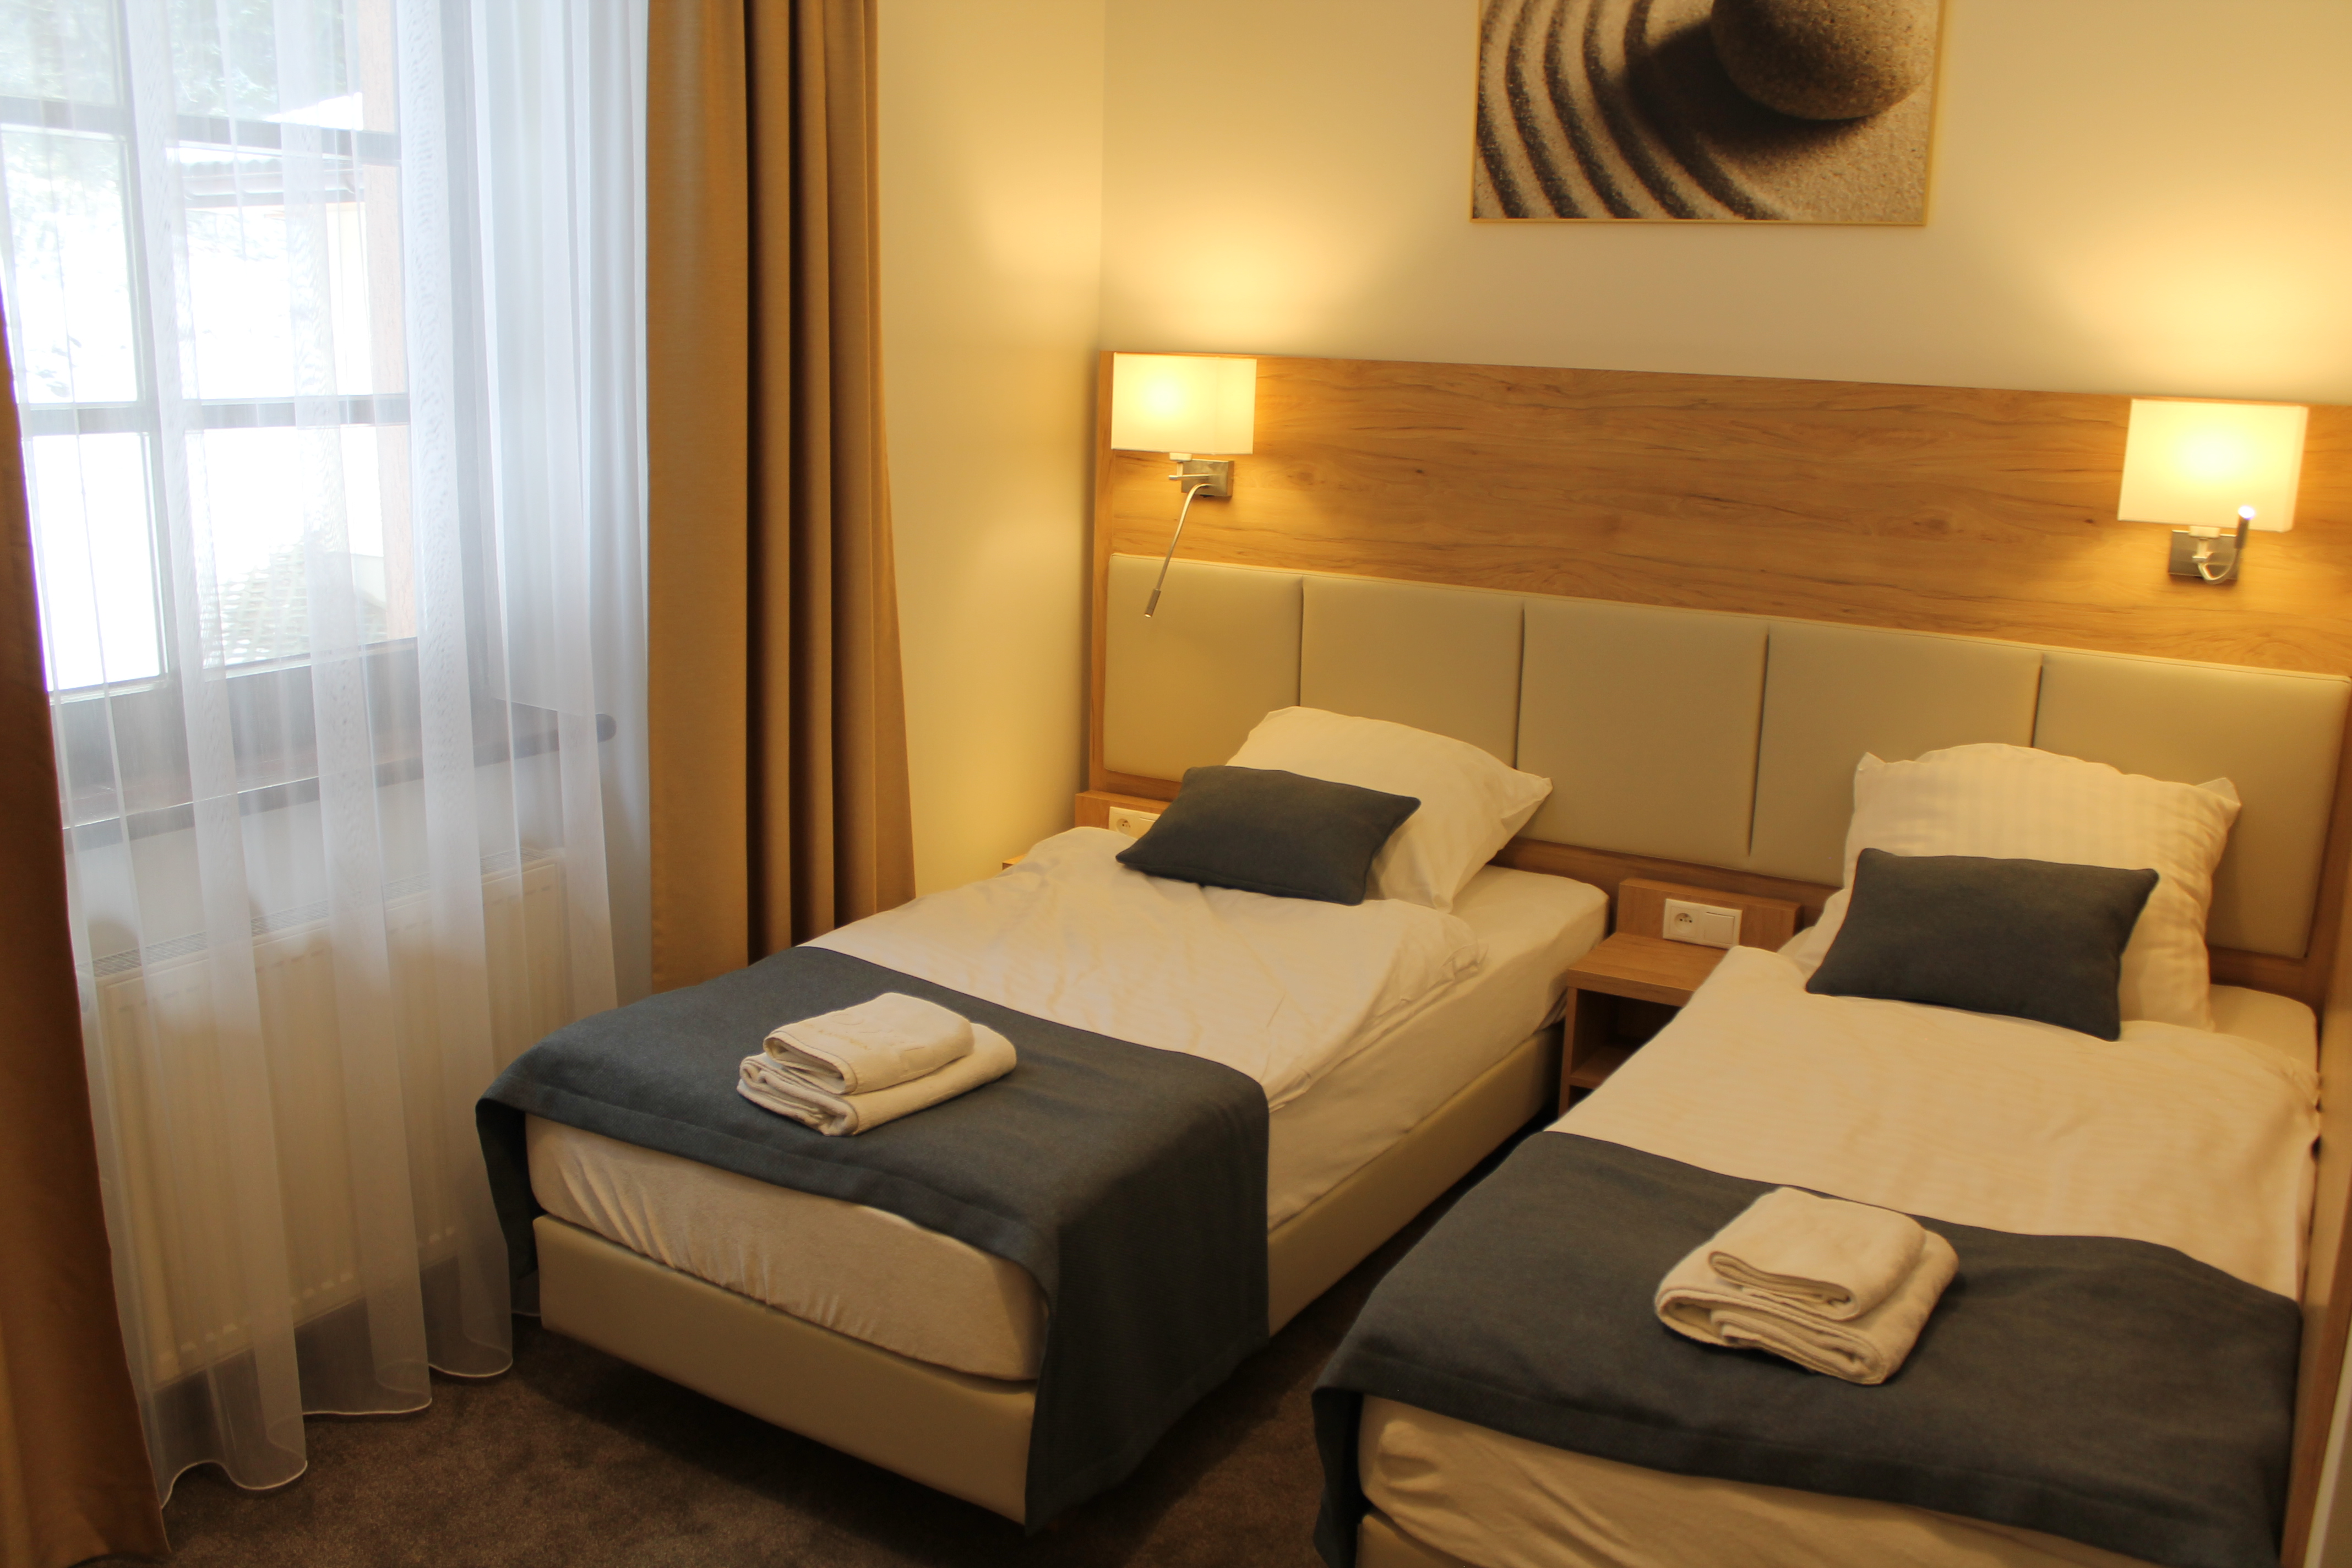 http://www.hotel-lipnica.pl/wp-content/uploads/2020/02/04_02.jpg